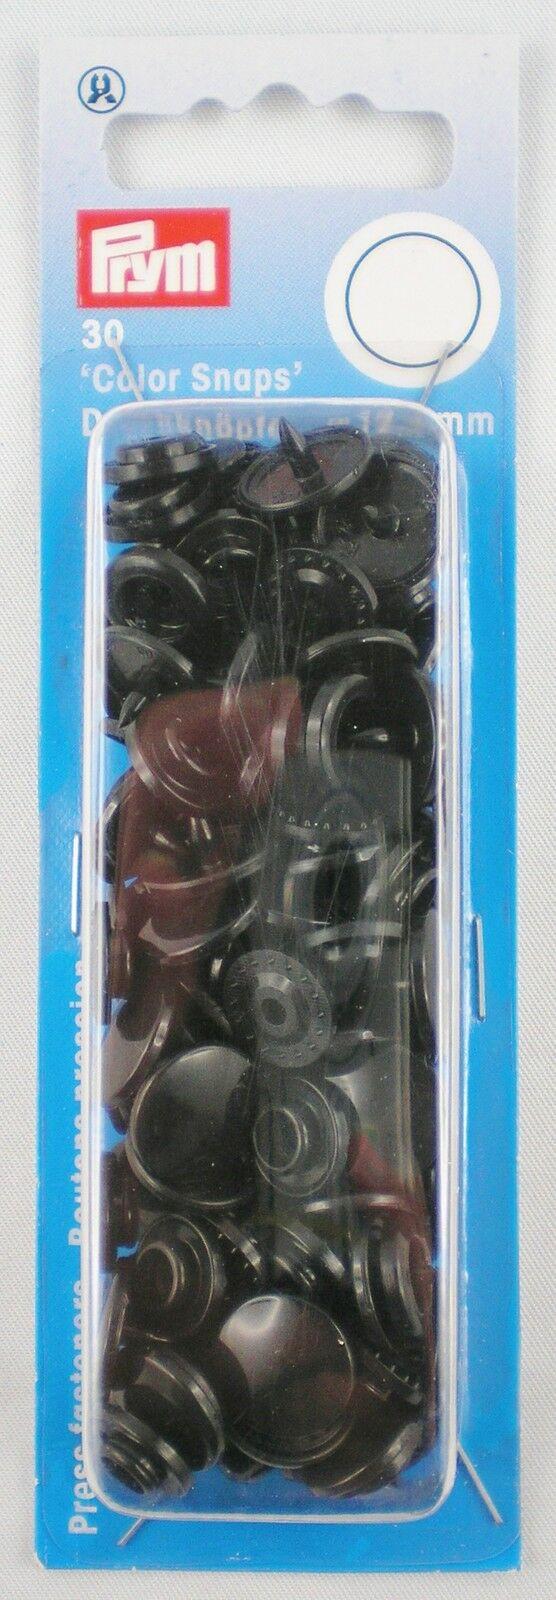 Kunststoff rund ColorSnaps Druckkn/öpfe n/ähfrei Prym Druckkn/öpfe 30 St/ück hell transparent 12,4/mm